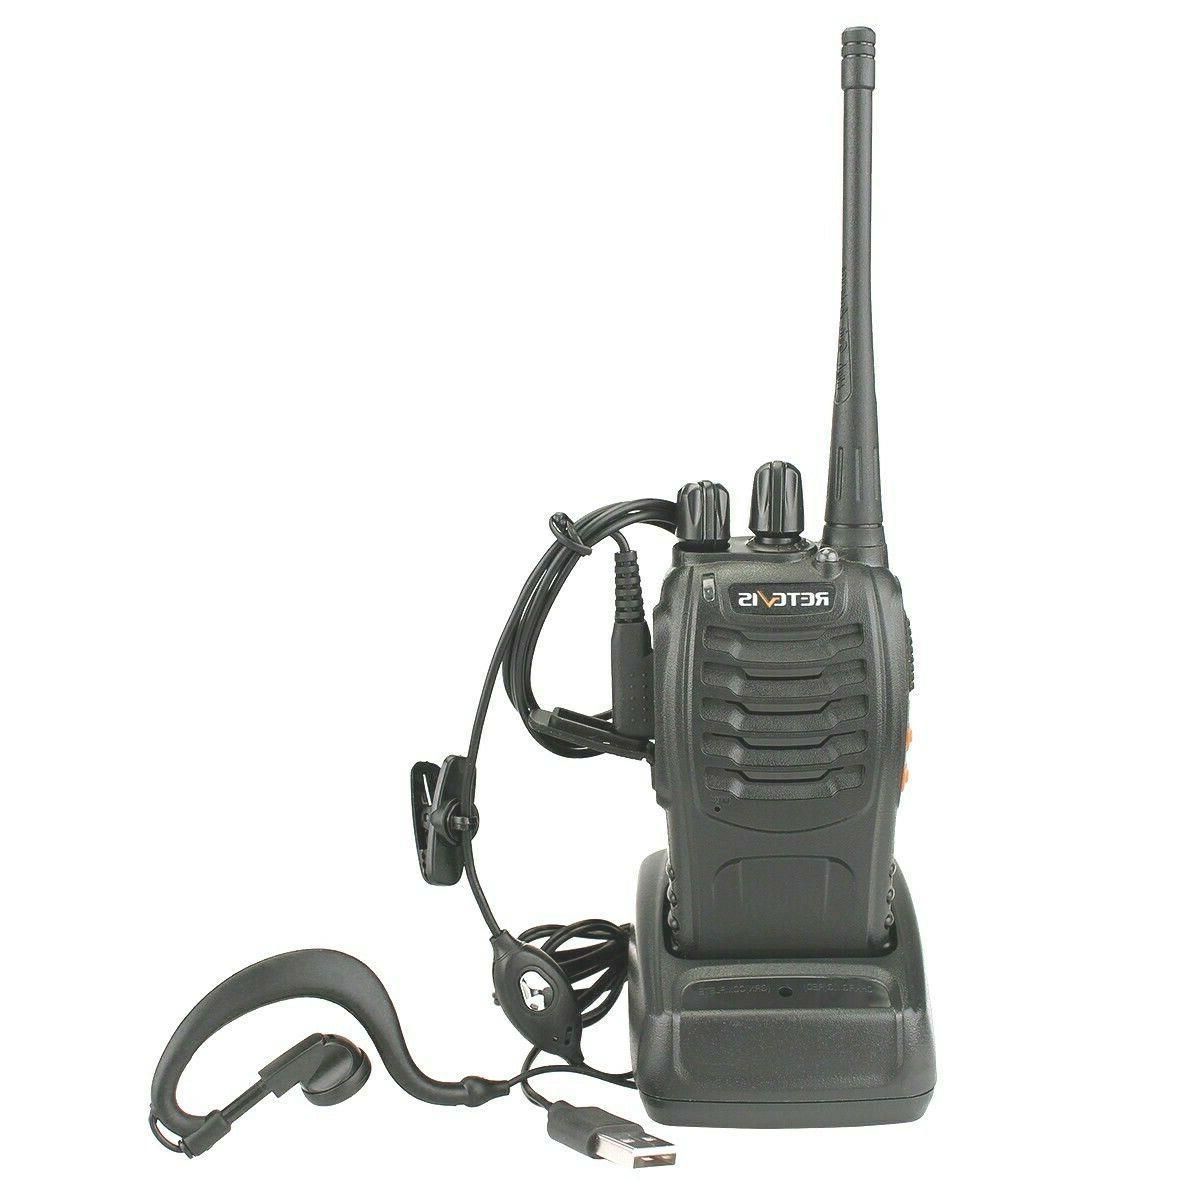 Retevis H777 UHF 400-470MHz 5W 16CH 1000mAh 2-Way Radio Walk